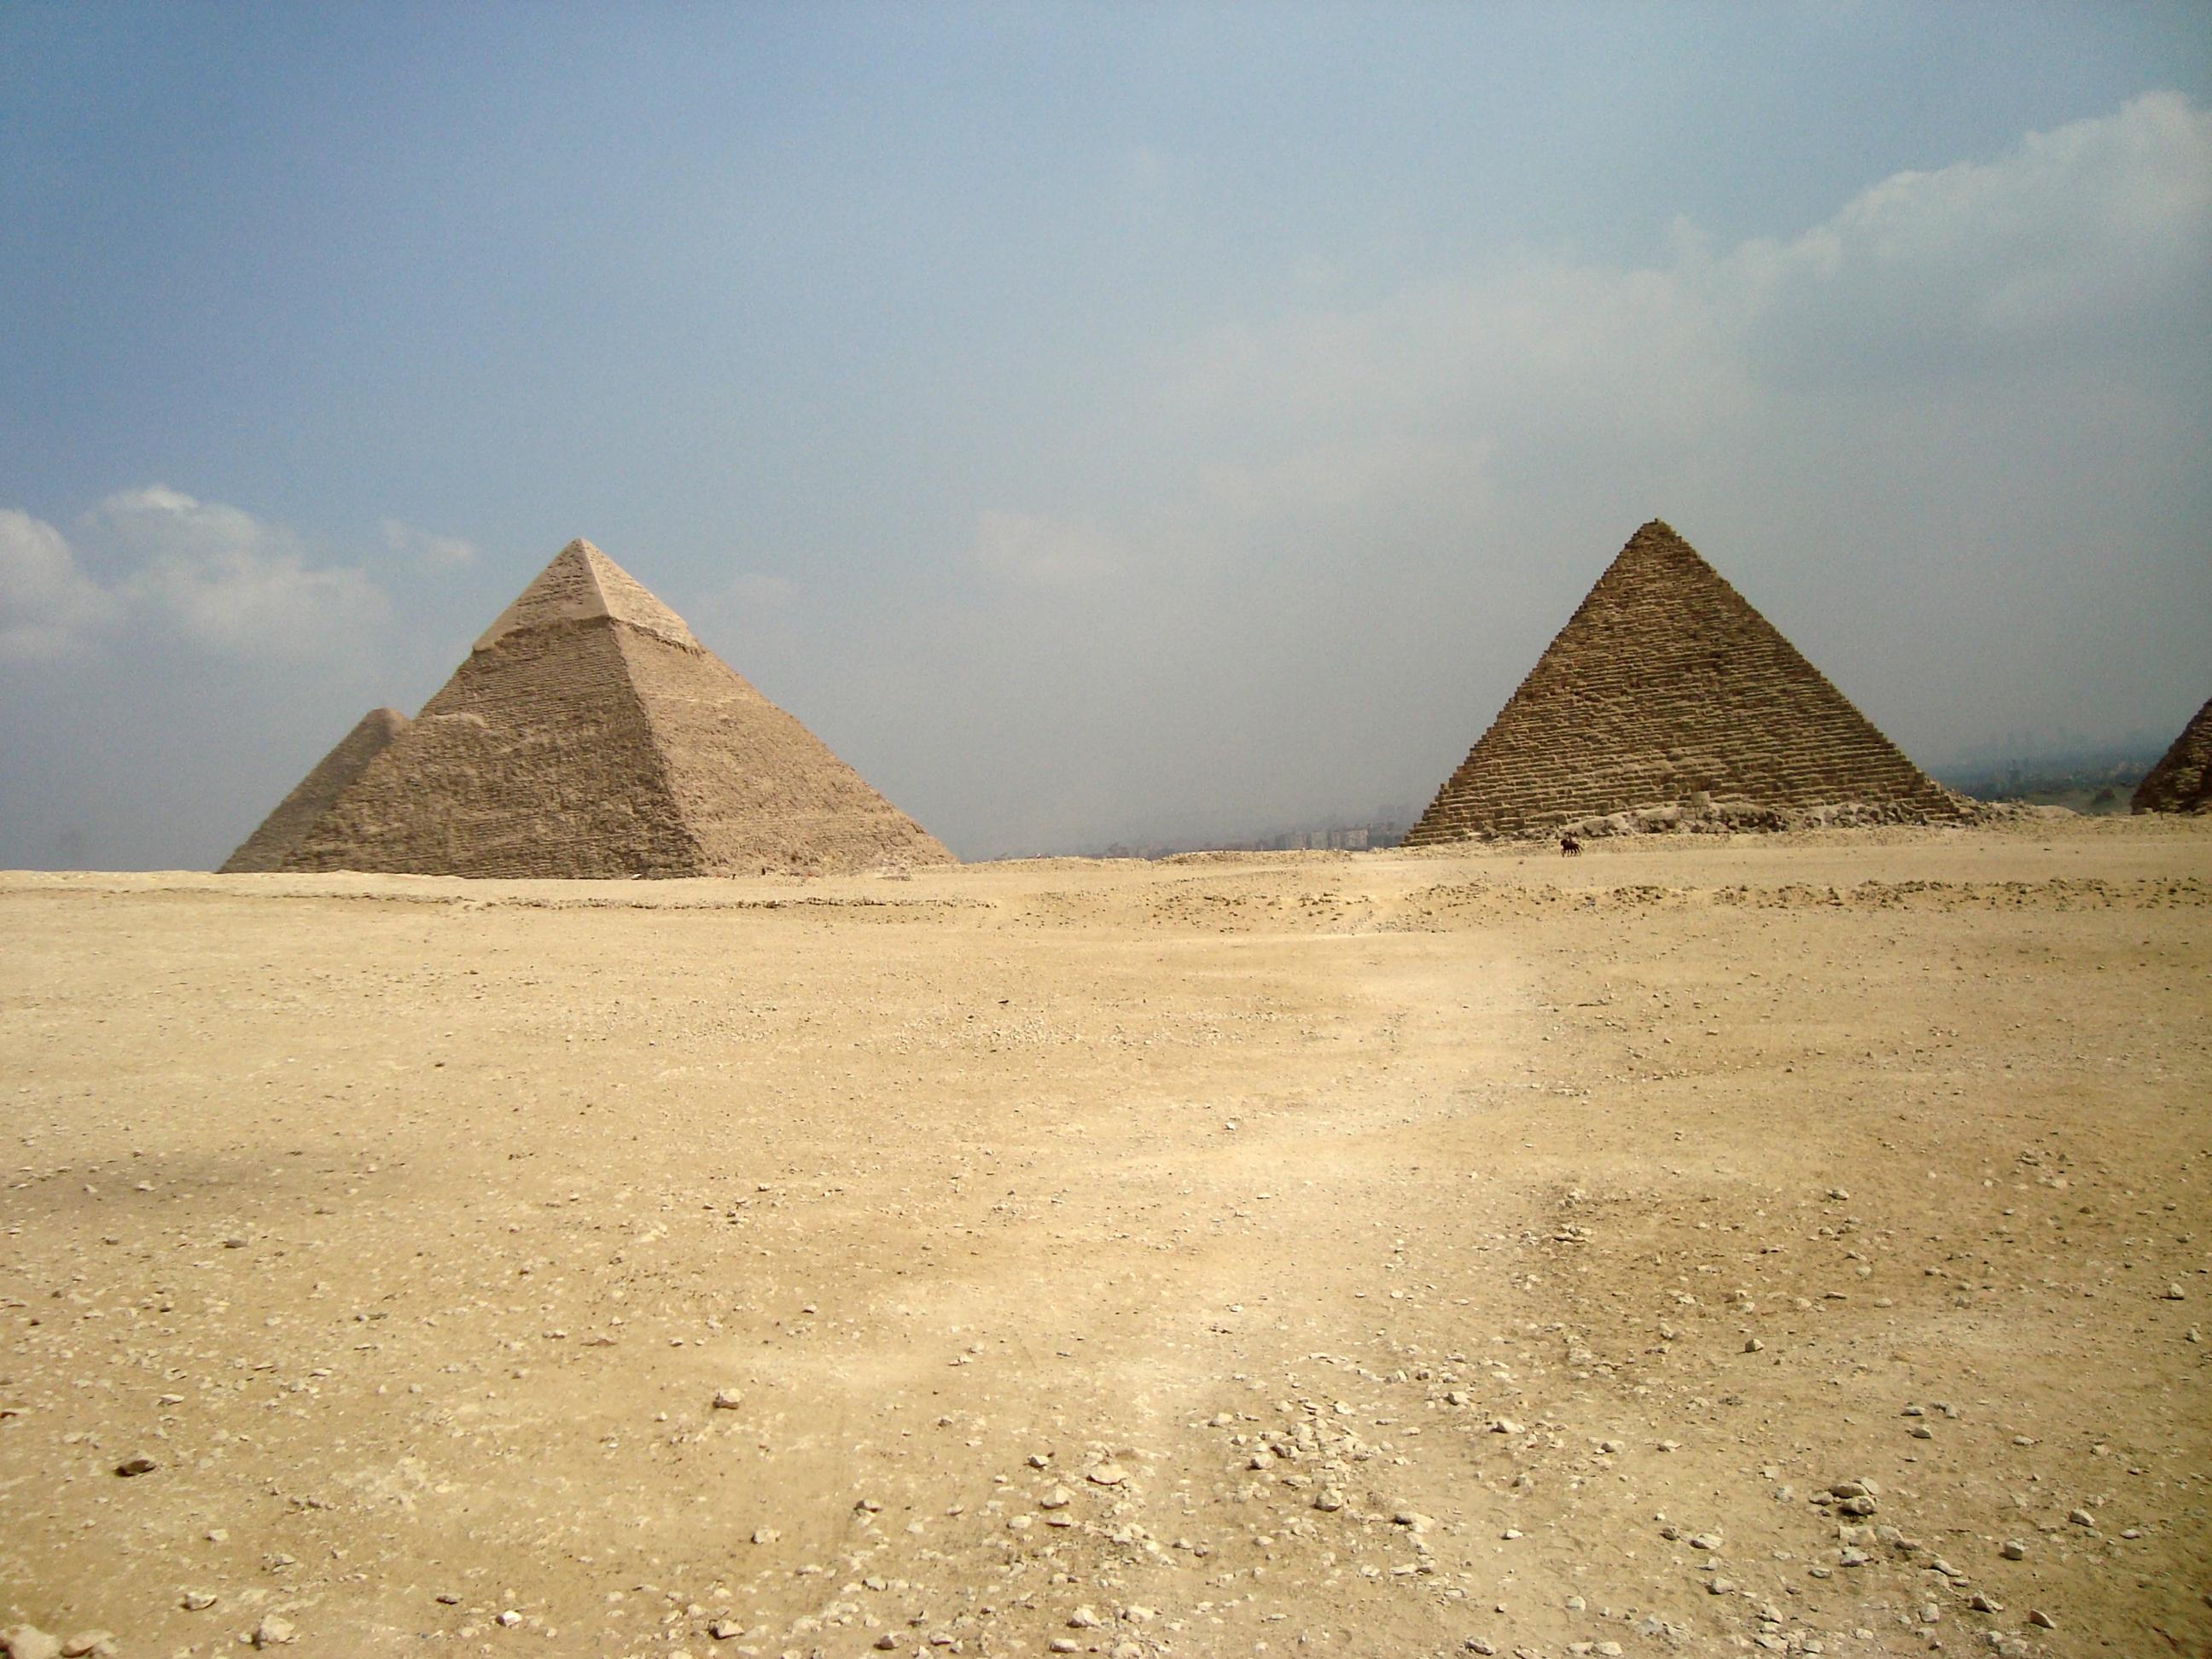 Gambar Gurun Monumen Piramida Mesir Tanah Tandus Dataran